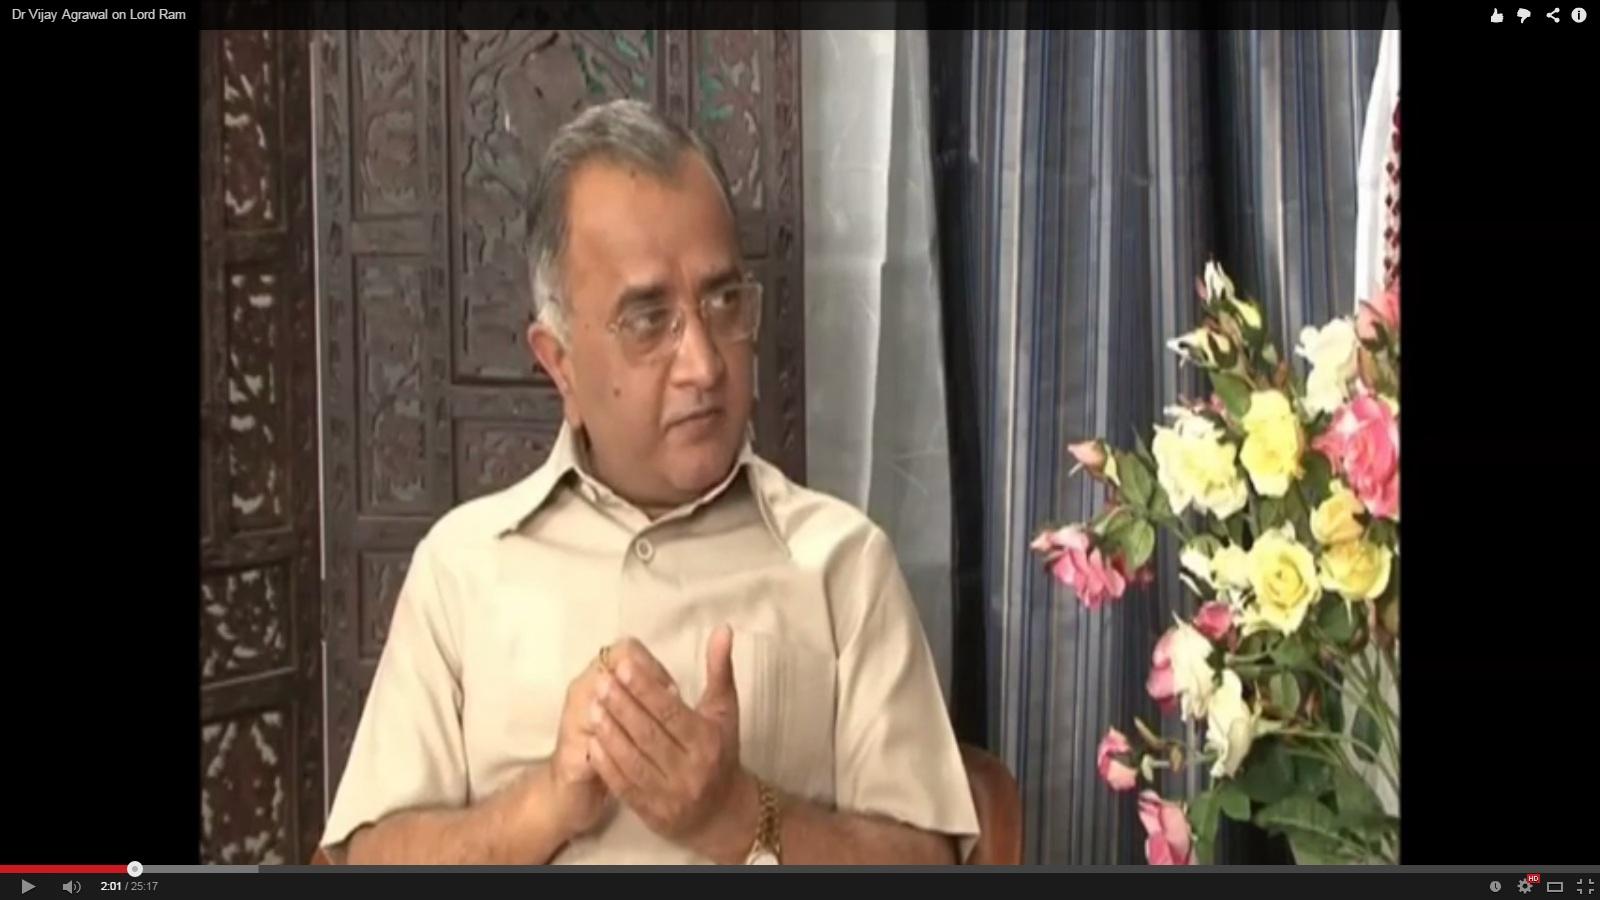 Dr Vijay Agrawal on Lord Ram